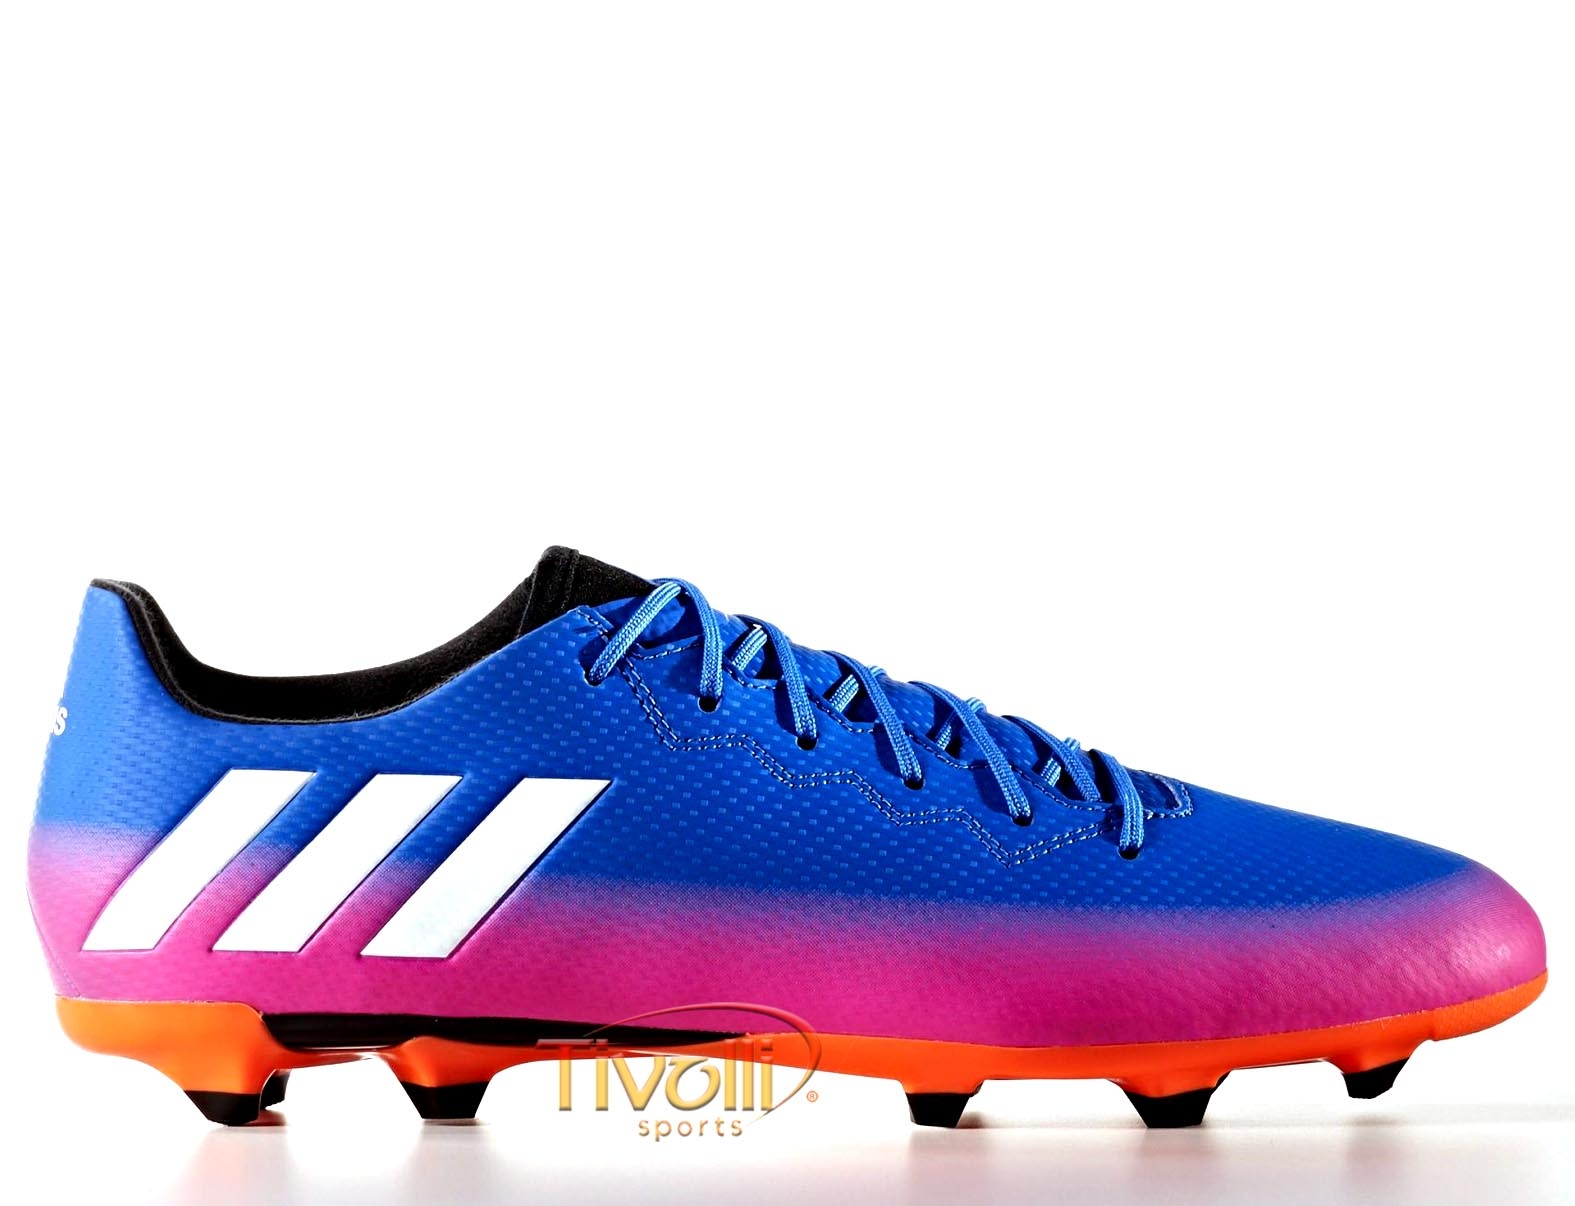 623afba1f6641 Chuteira Adidas Messi 16.3 Firm Ground FG Campo